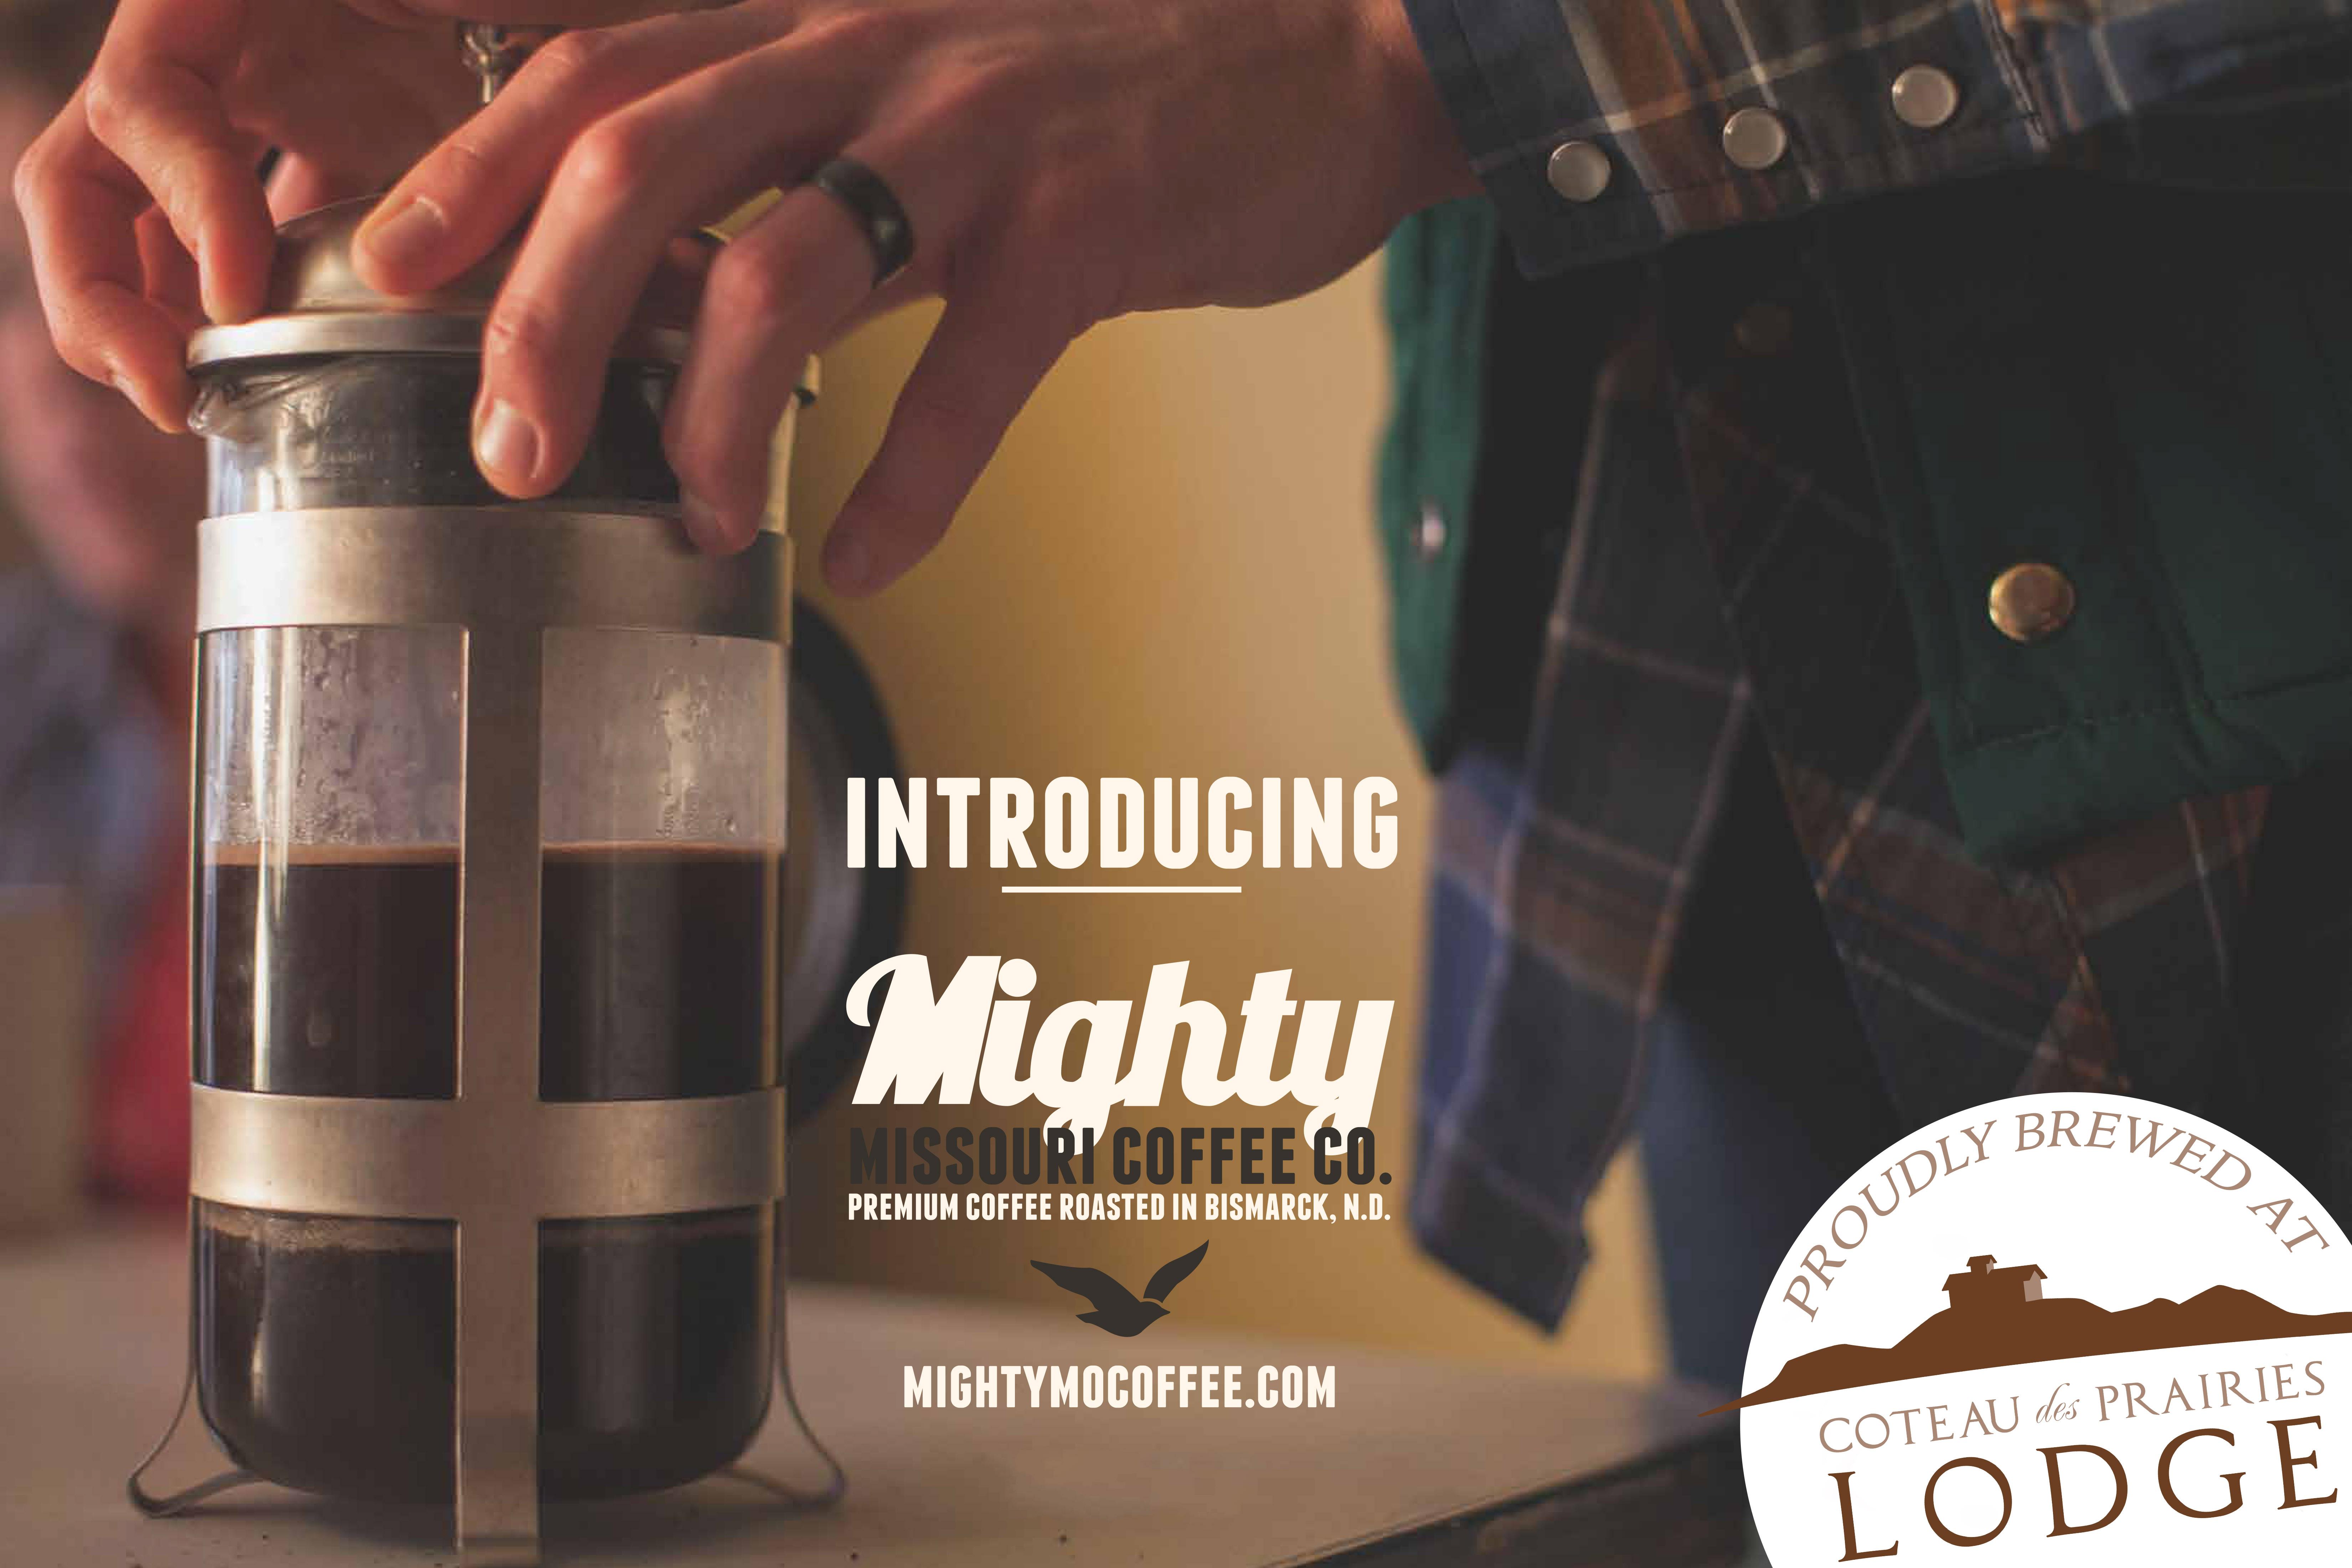 Mighty Missouri Coffee Company at Coteau des Prairies Lodge